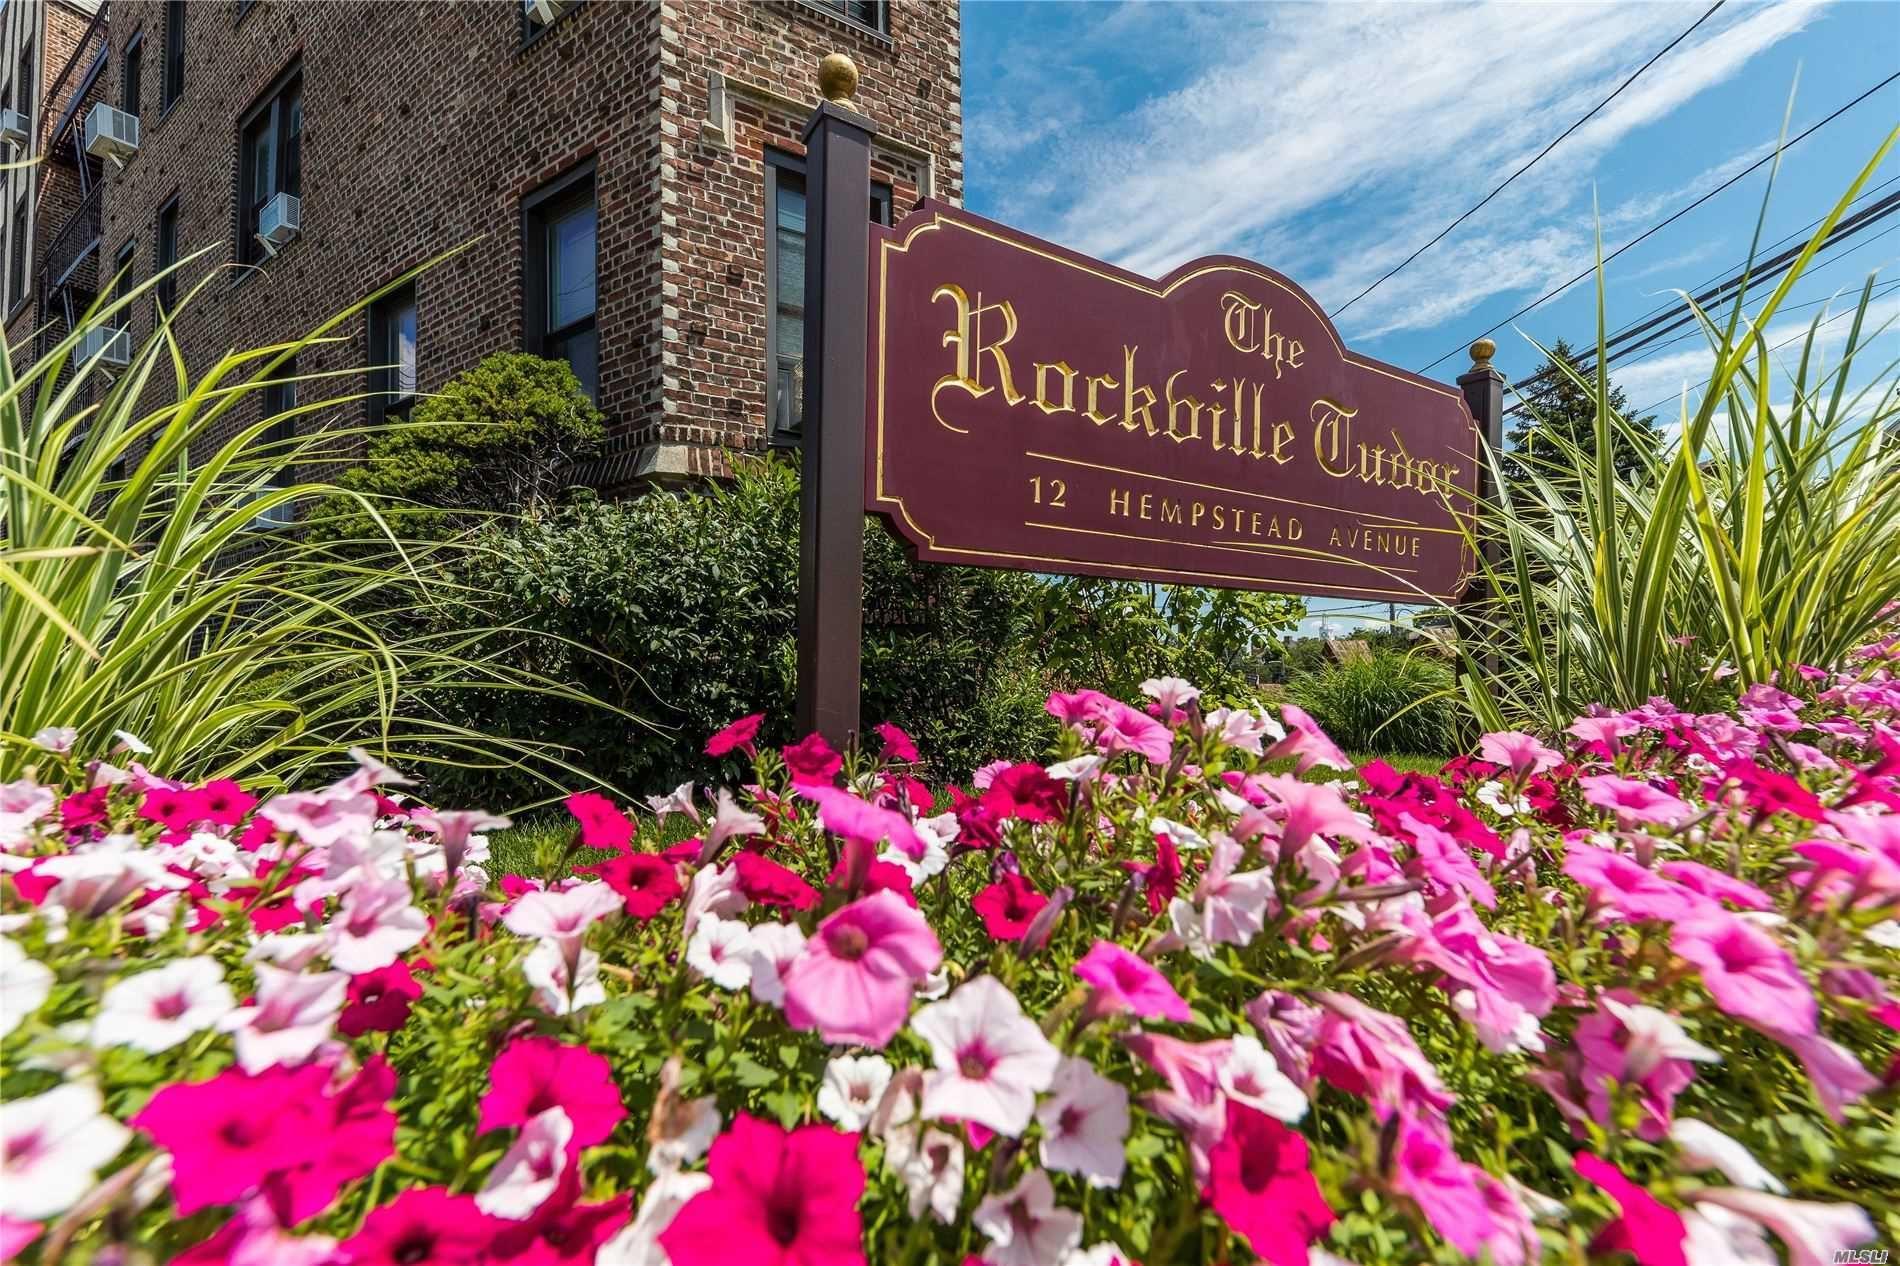 12 Hempstead Avenue #3R, Rockville Centre, NY 11570 - MLS#: 3241611